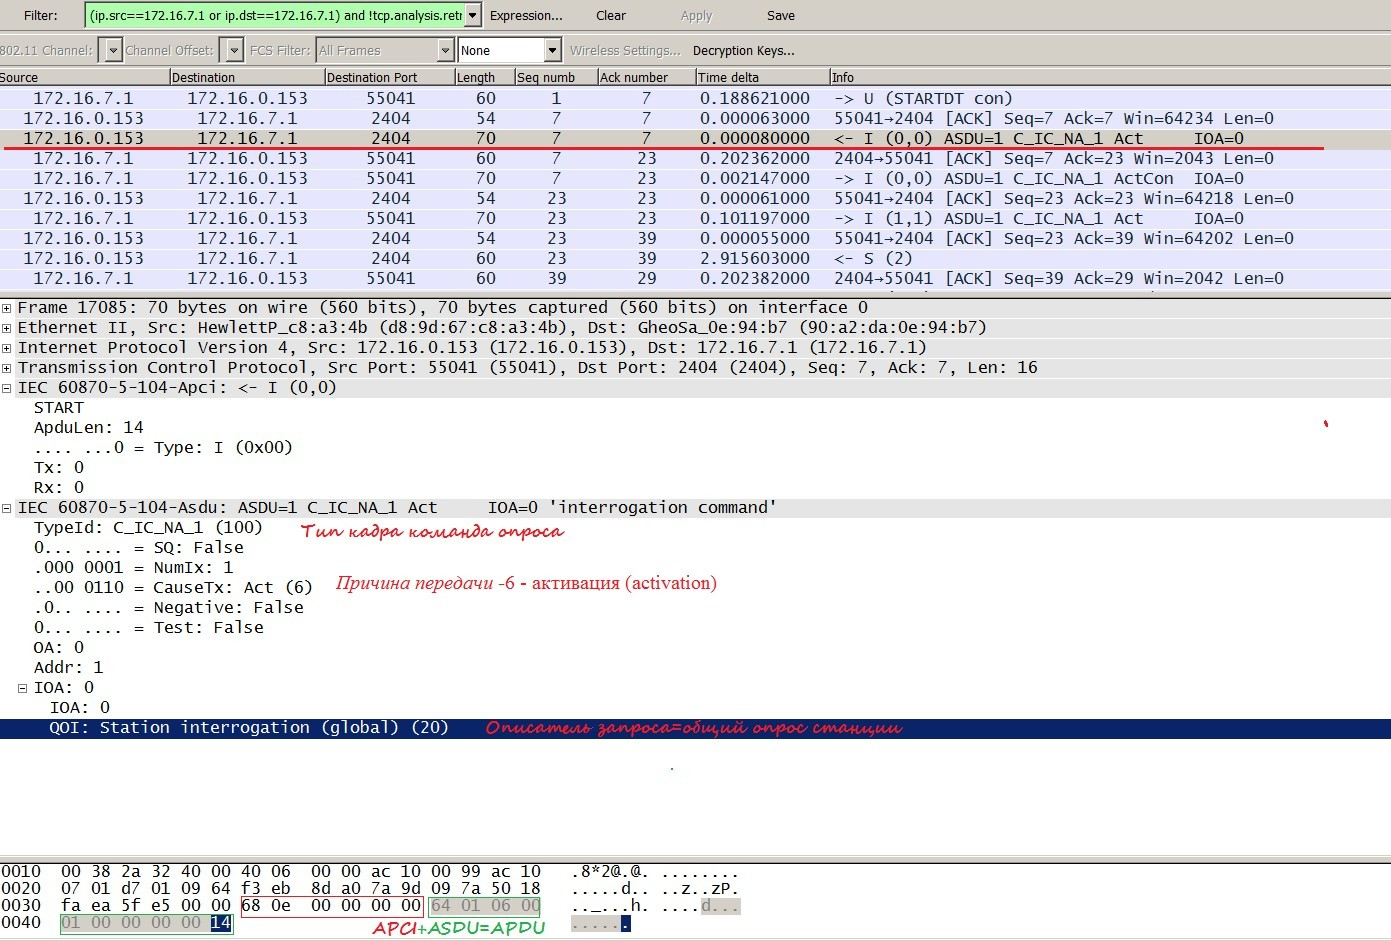 Как я писал библиотеку под МЭК 870-5-104 на Arduino при помощи Wireshark - 10